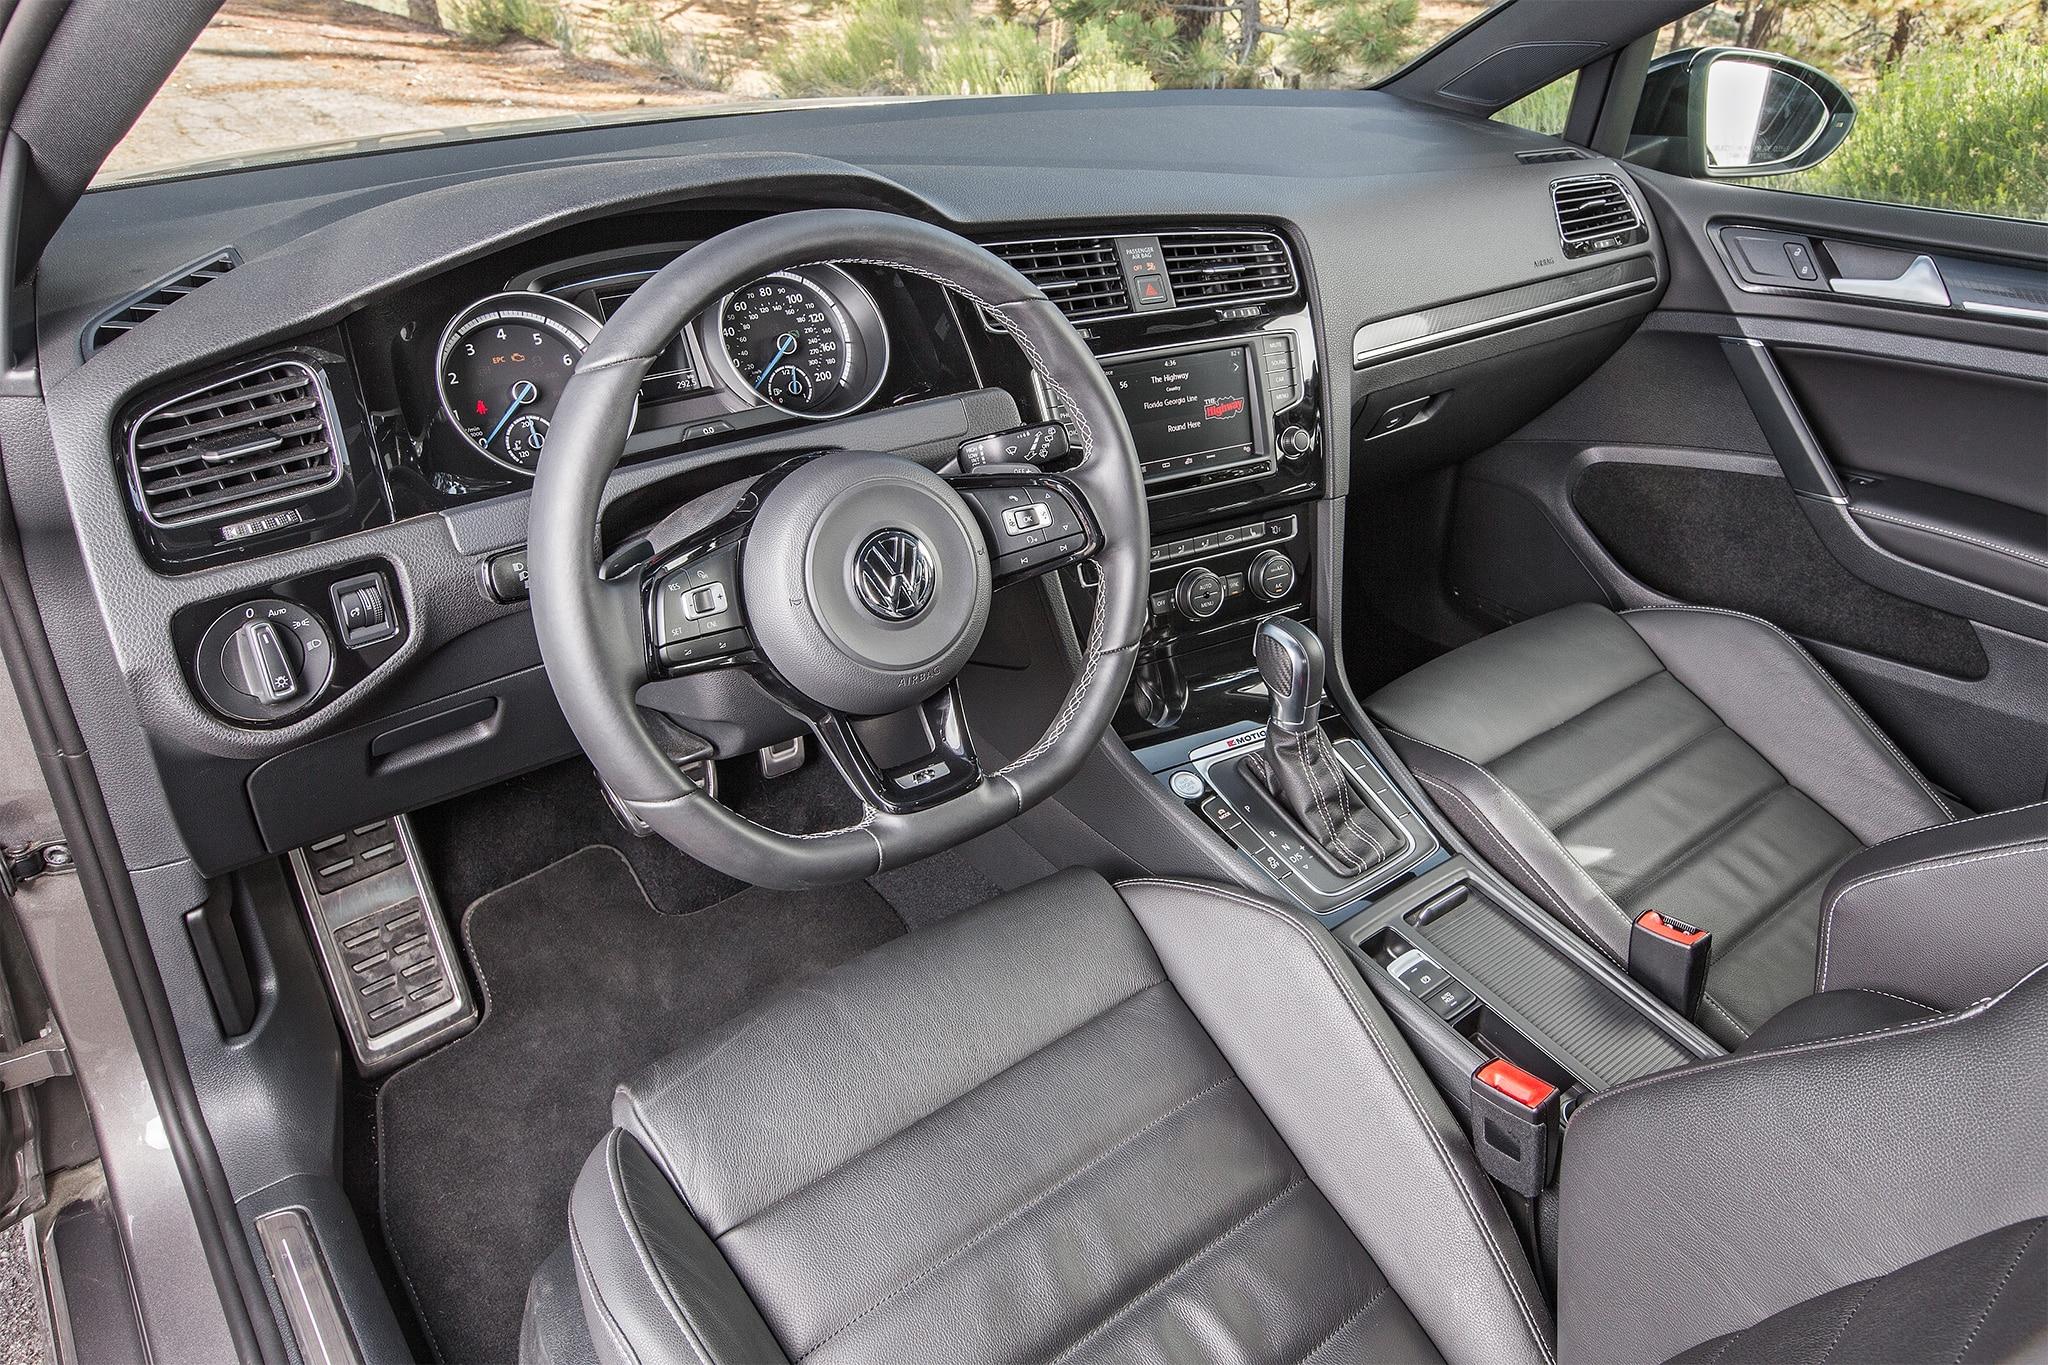 2016 Volkswagen Golf R cabin